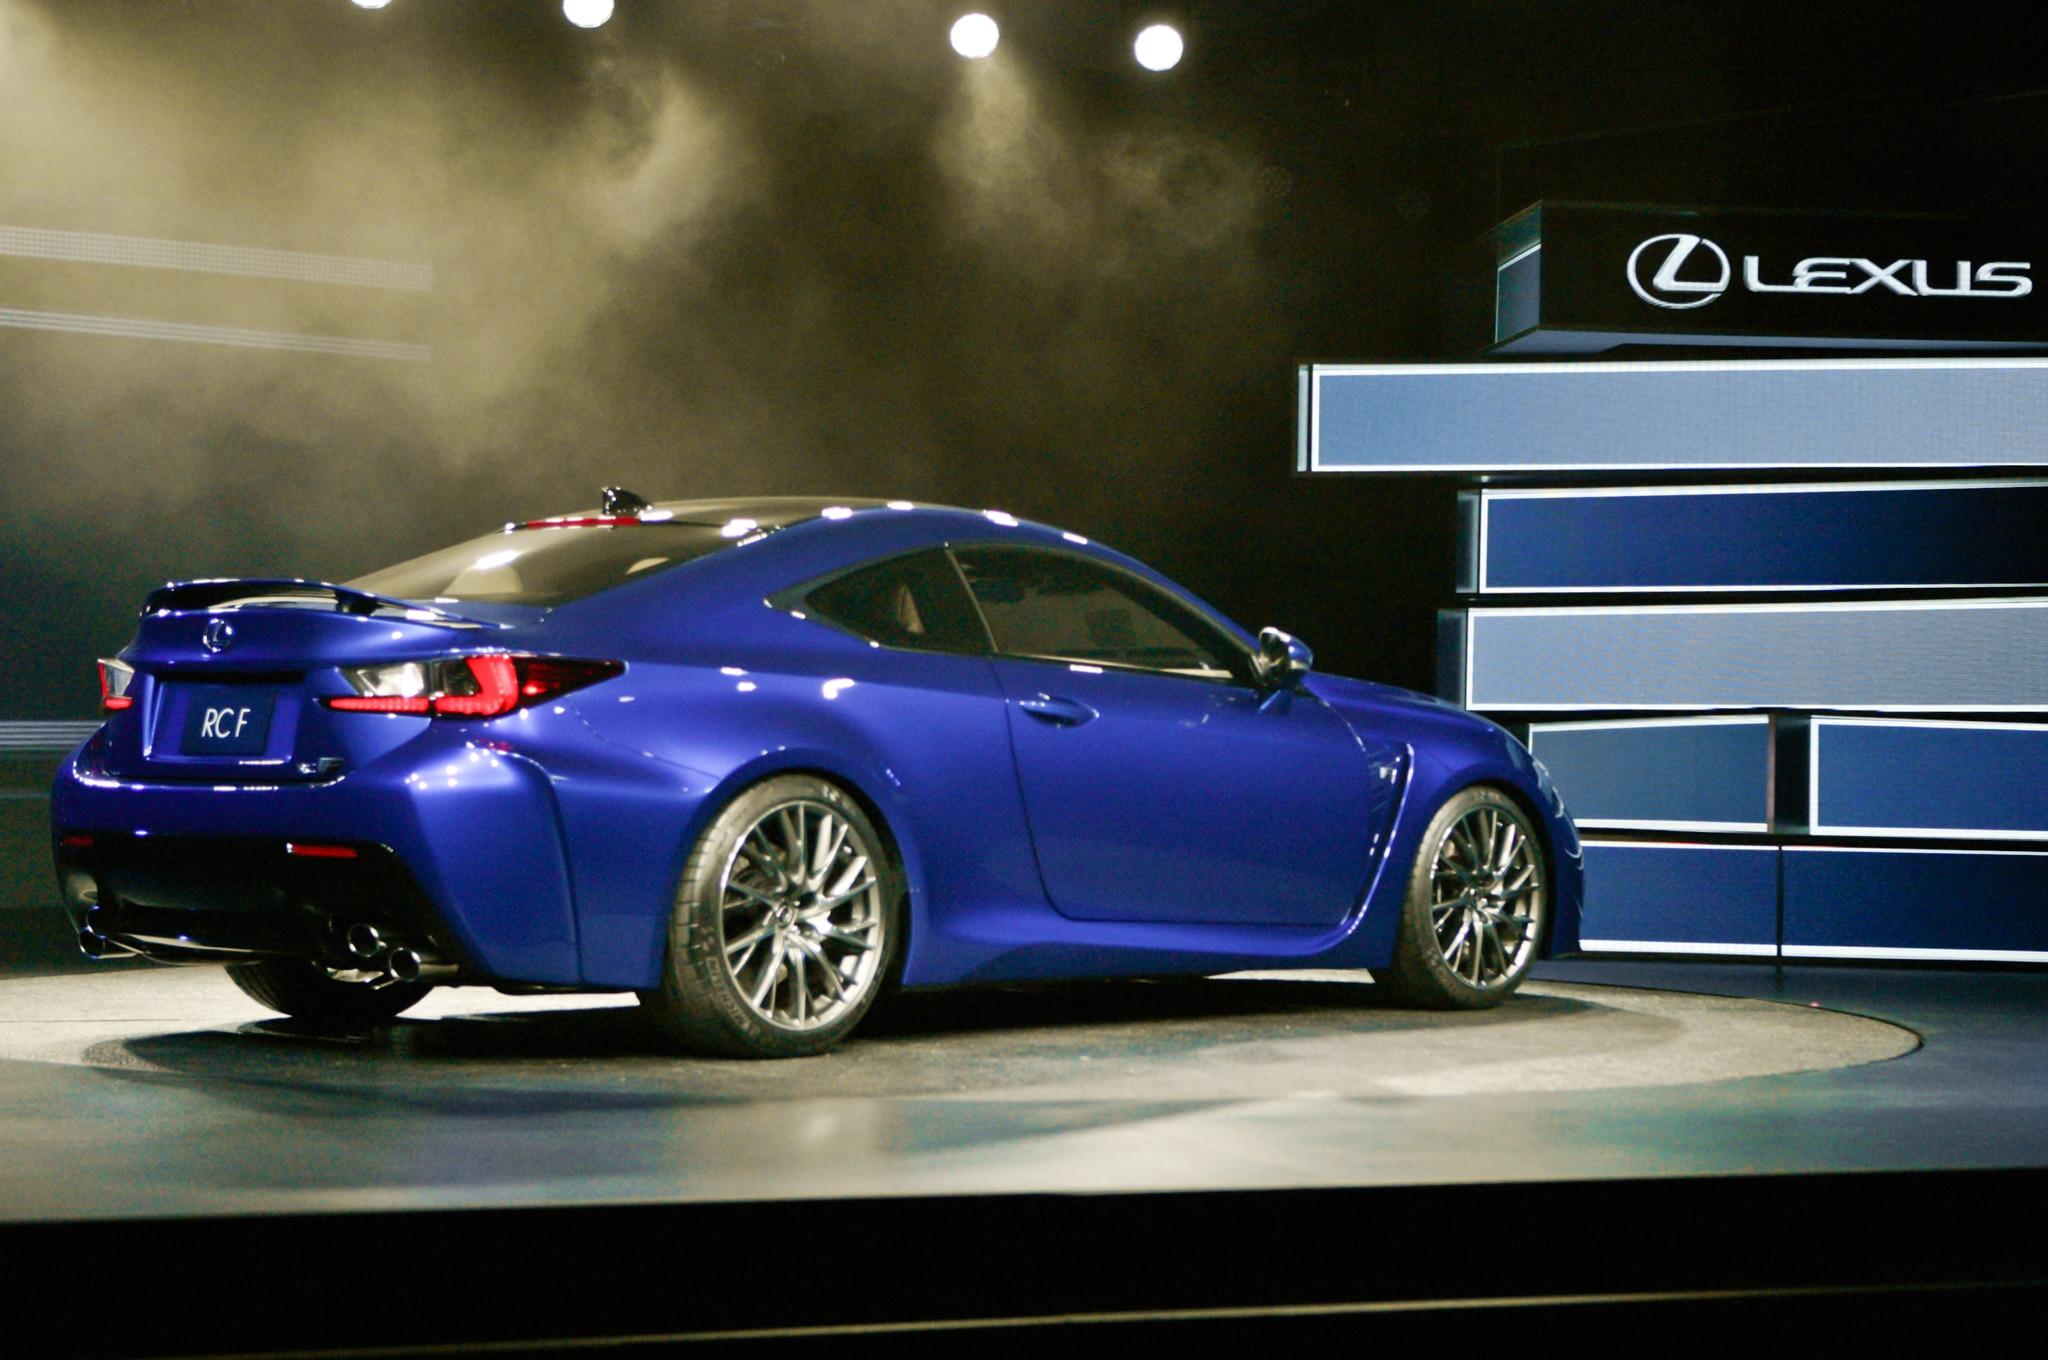 https://st.automobilemag.com/uploads/sites/11/2014/01/2015-Lexus-RC-F-rear-three-quarter.jpg